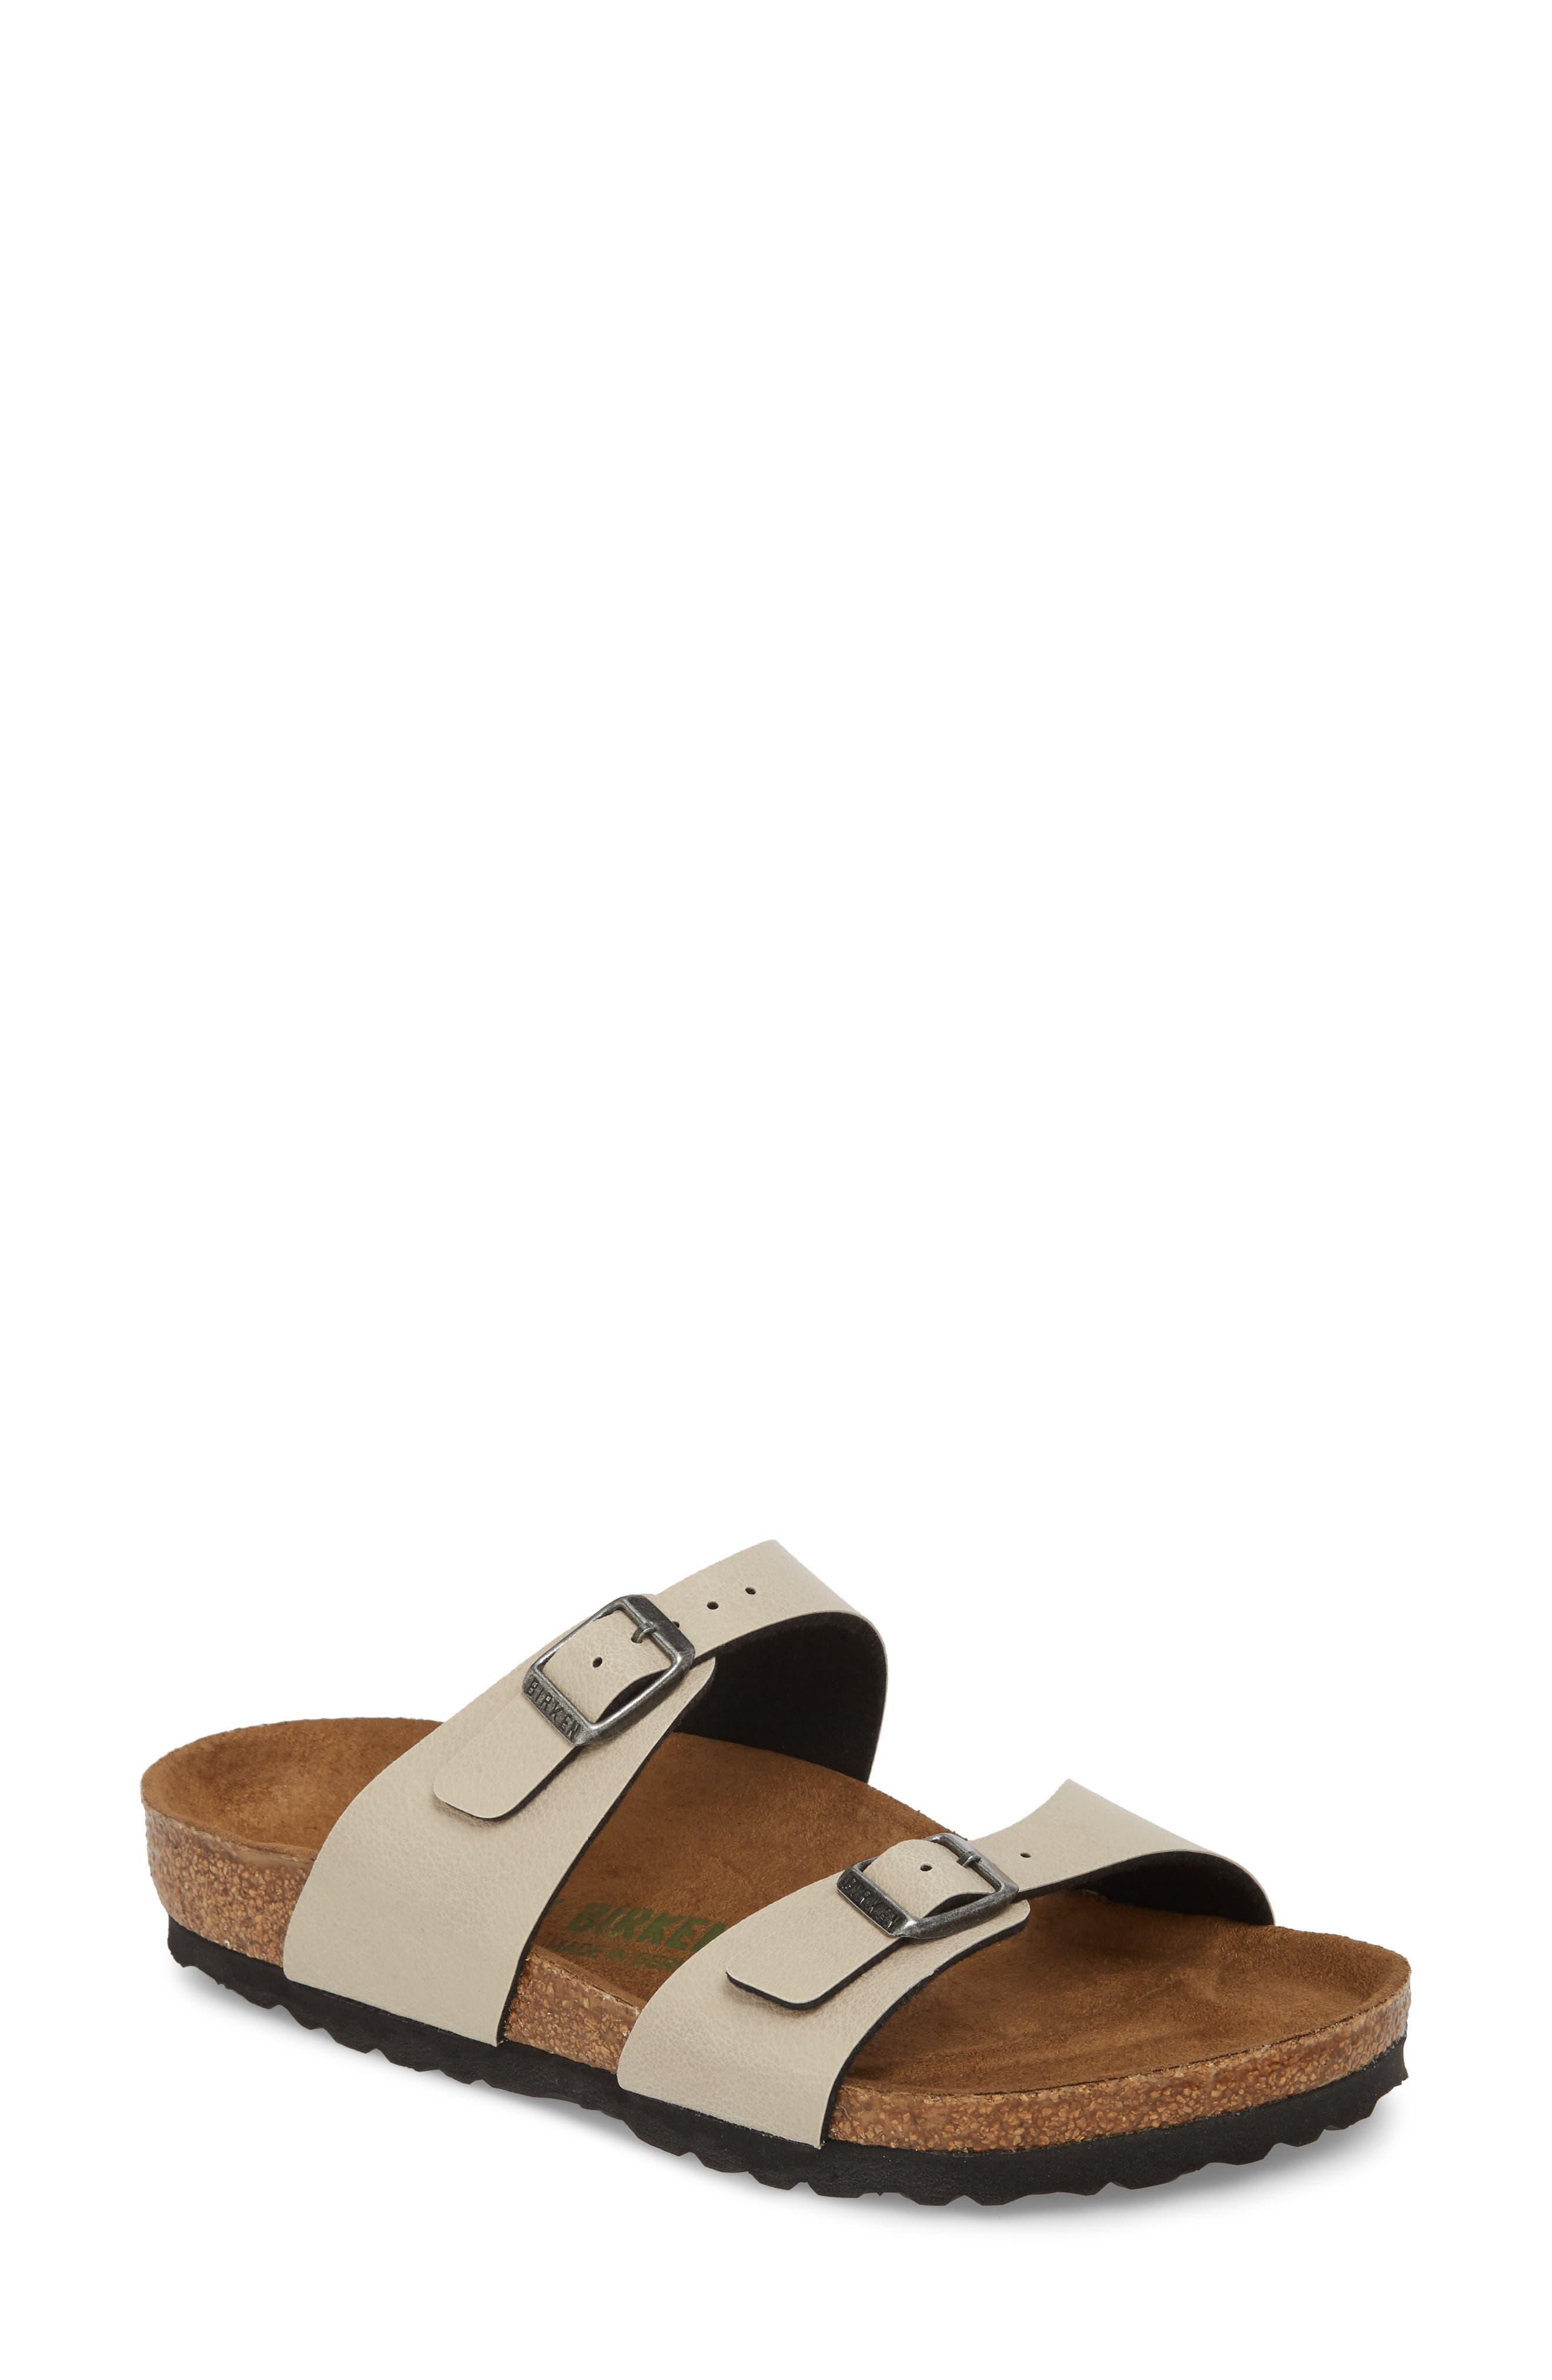 'Sydney' Sandal,                         Main,                         color, Stone Leather